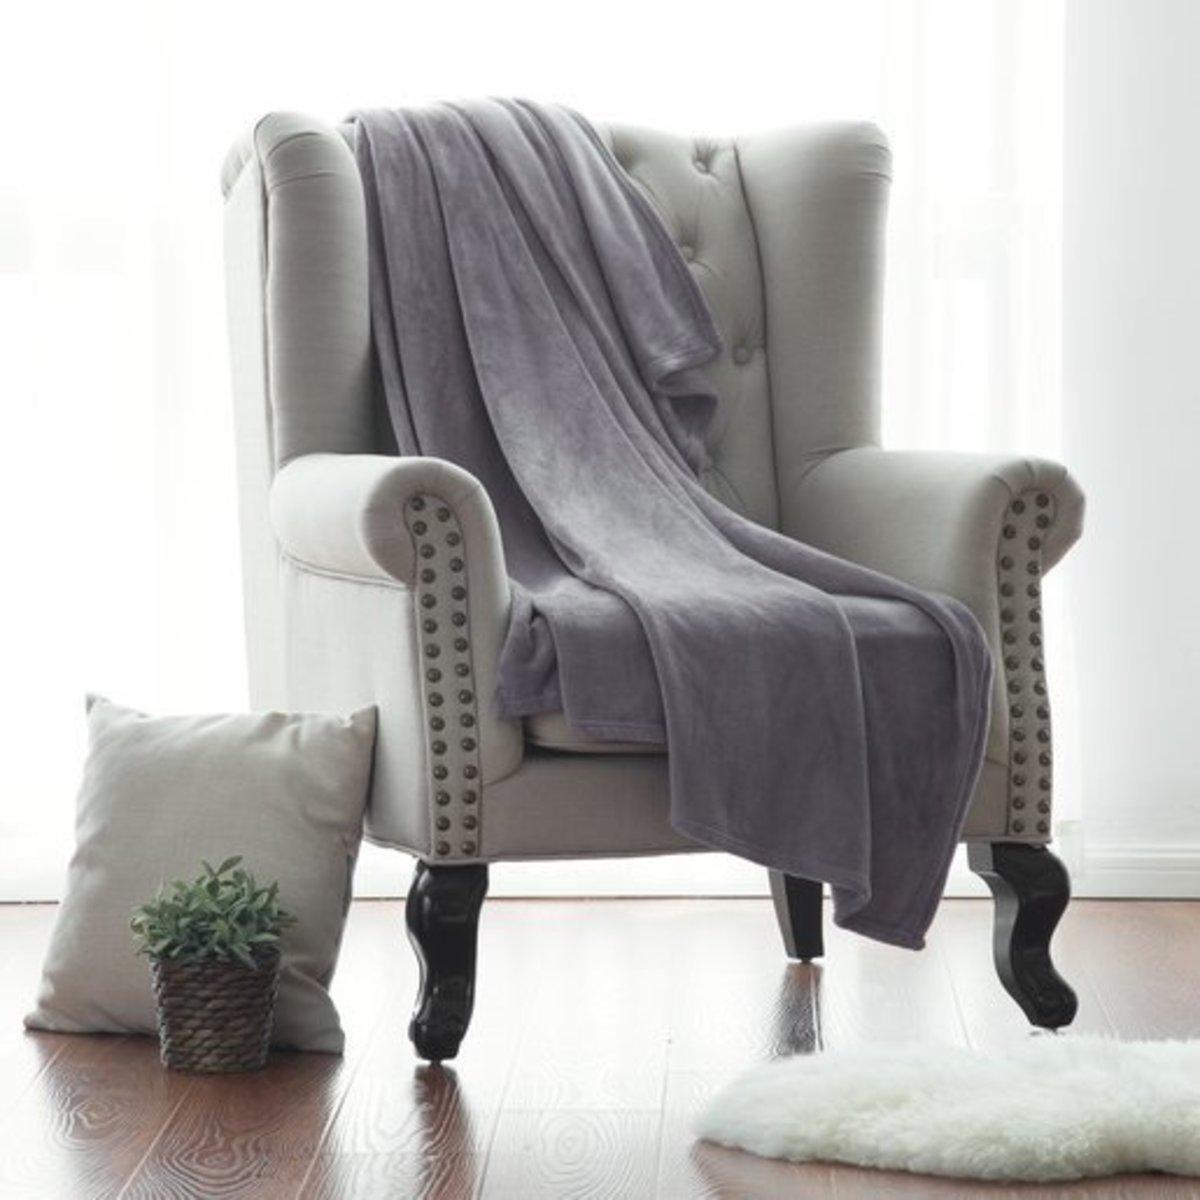 勾牙利 RENOWN Premium Classic Flannel 法蘭絨保暖被 [Office Size] / Light Grey